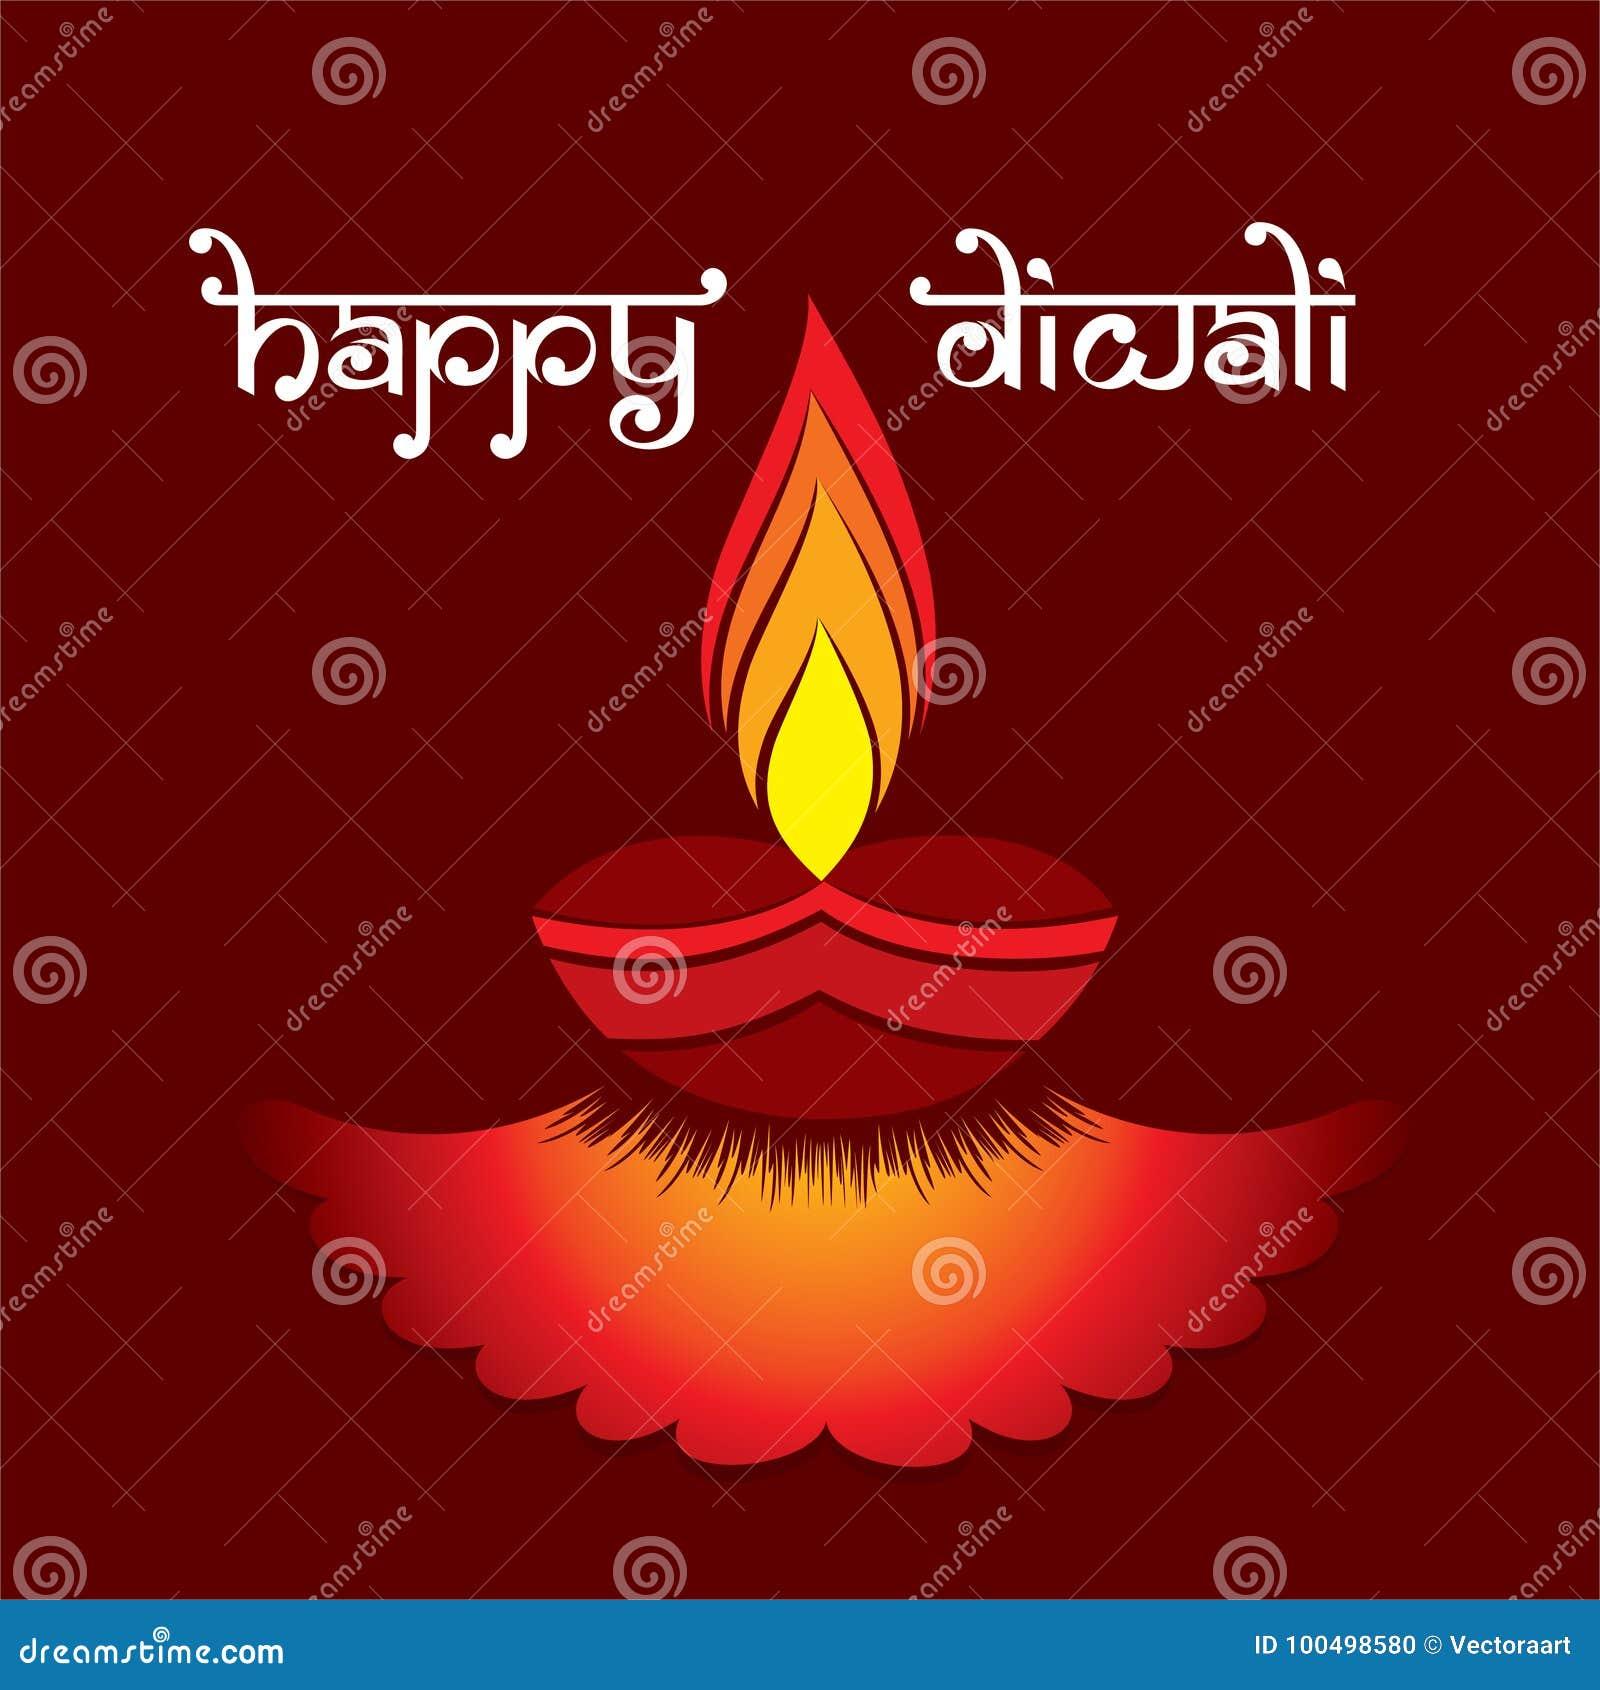 Creative happy diwali festival greeting design stock vector a creative greeting card with decorated diya indian diwali festival celebration design m4hsunfo